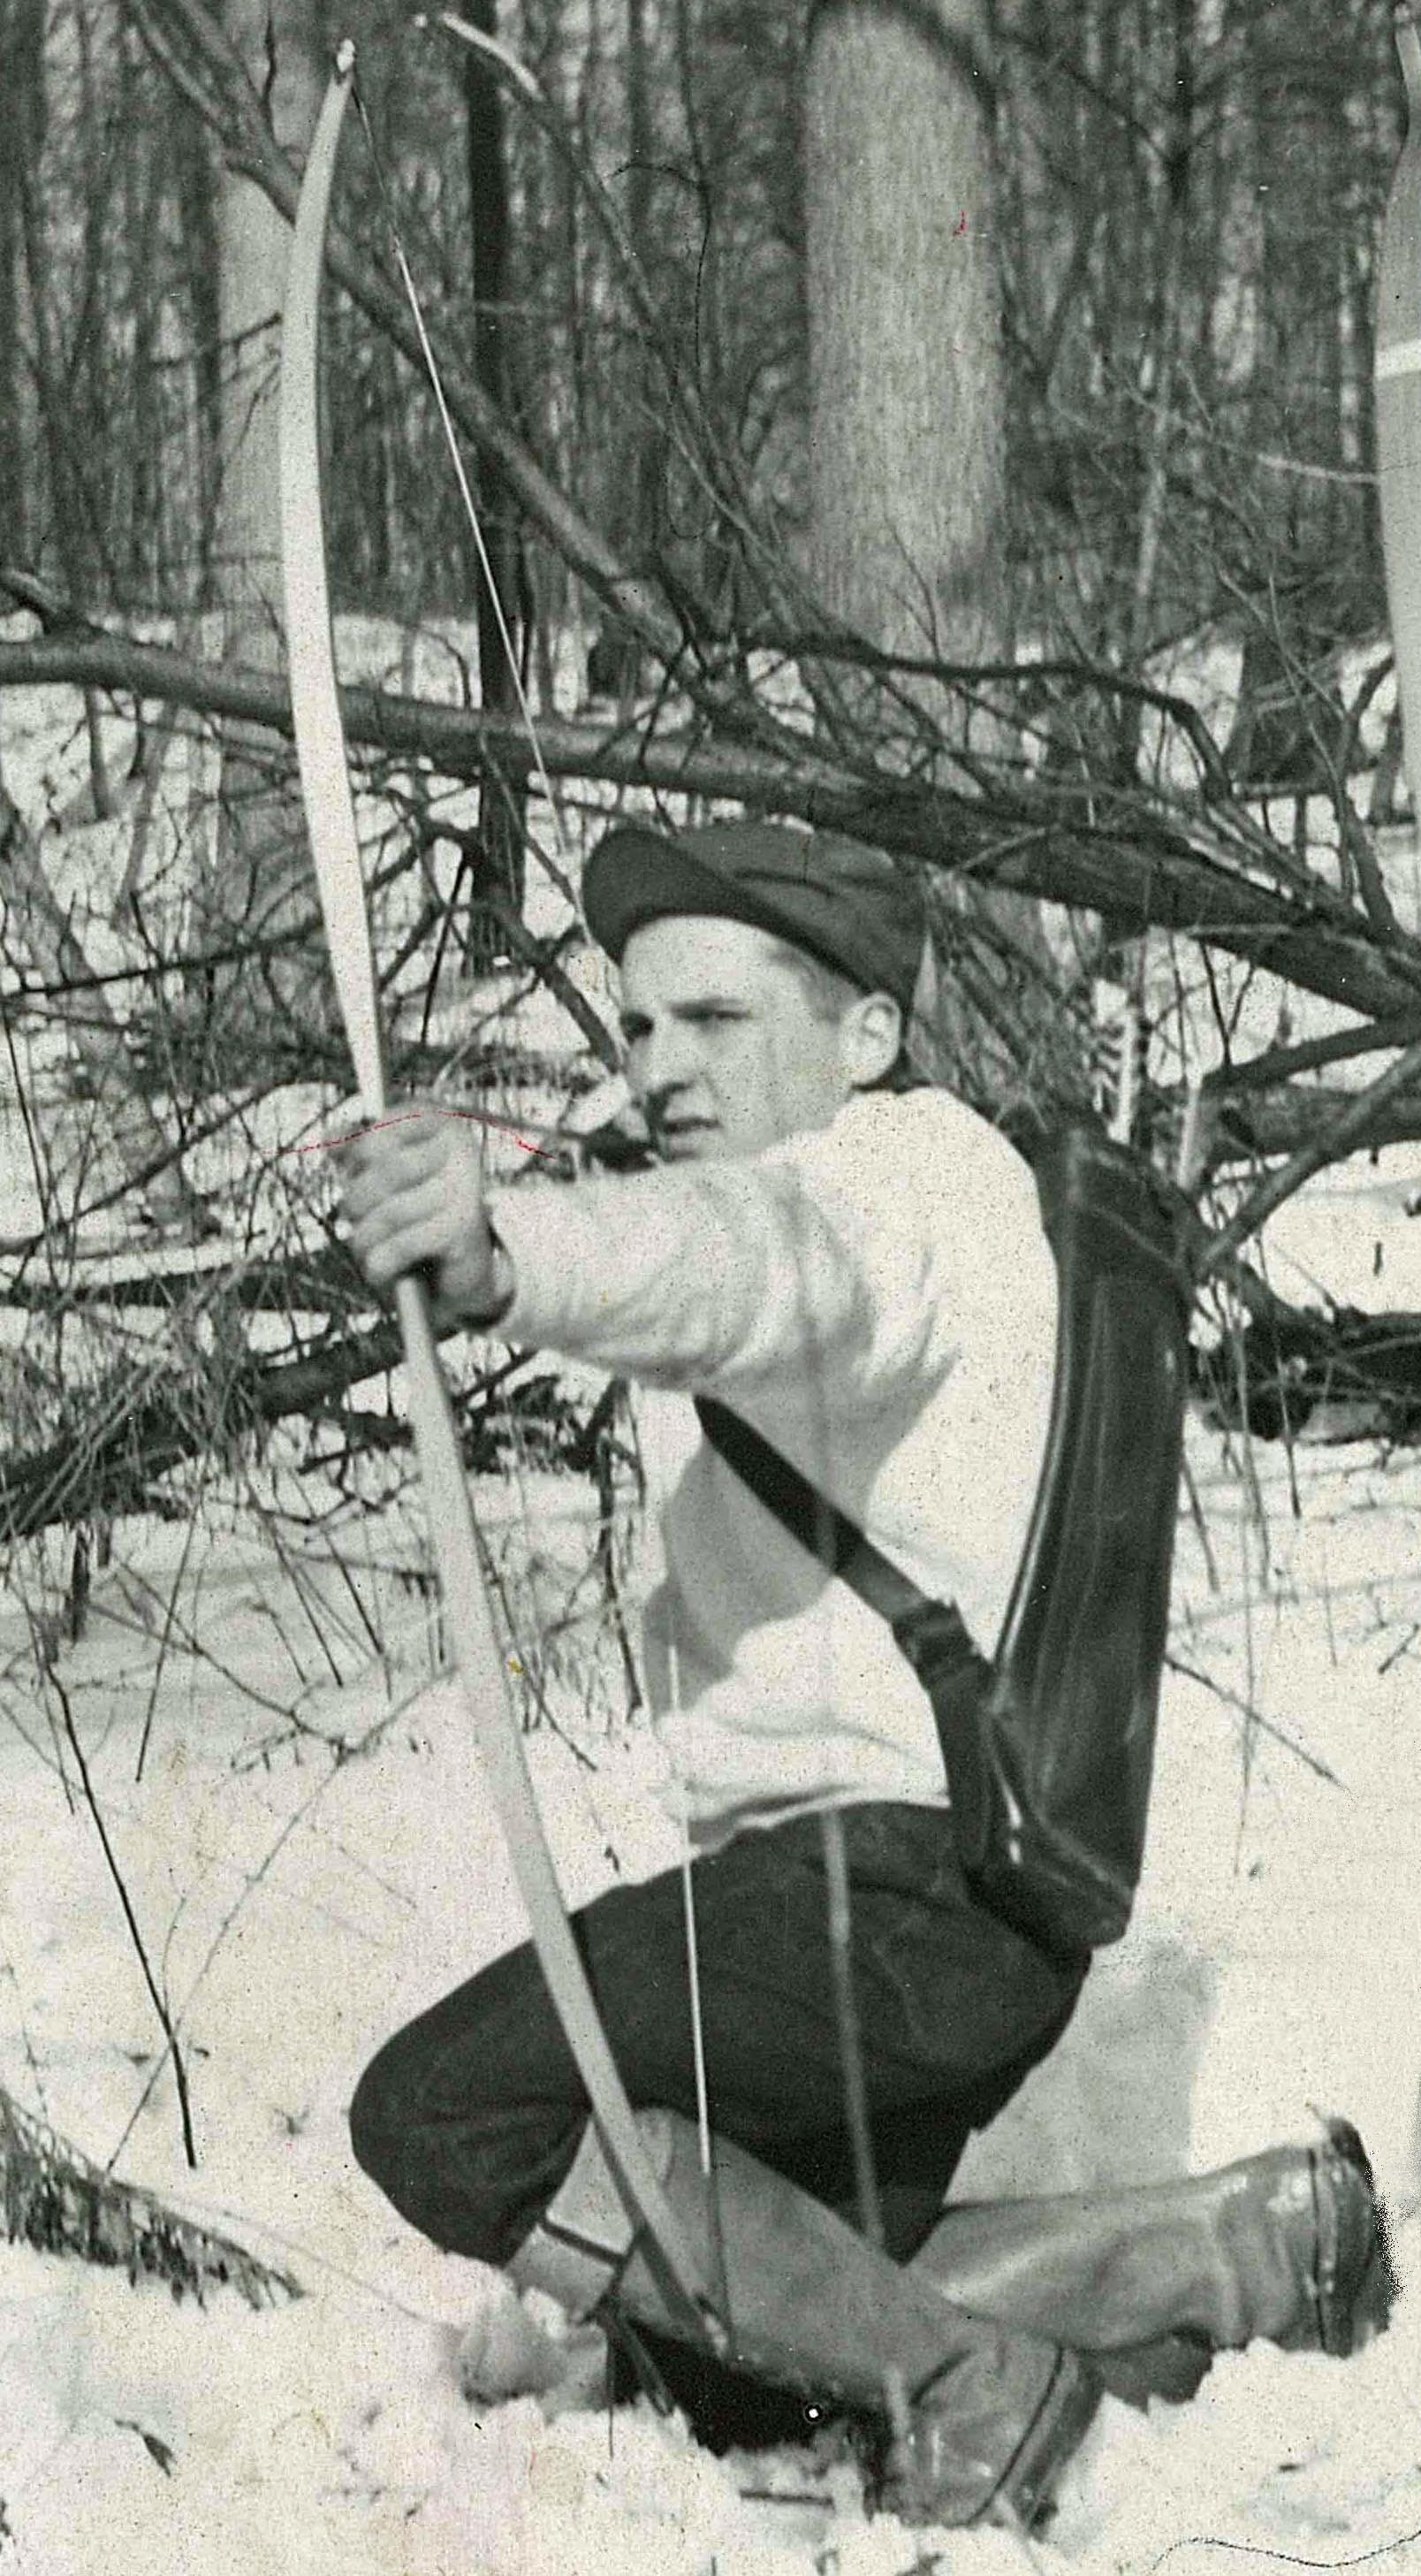 Jerry Ralph Tuominen